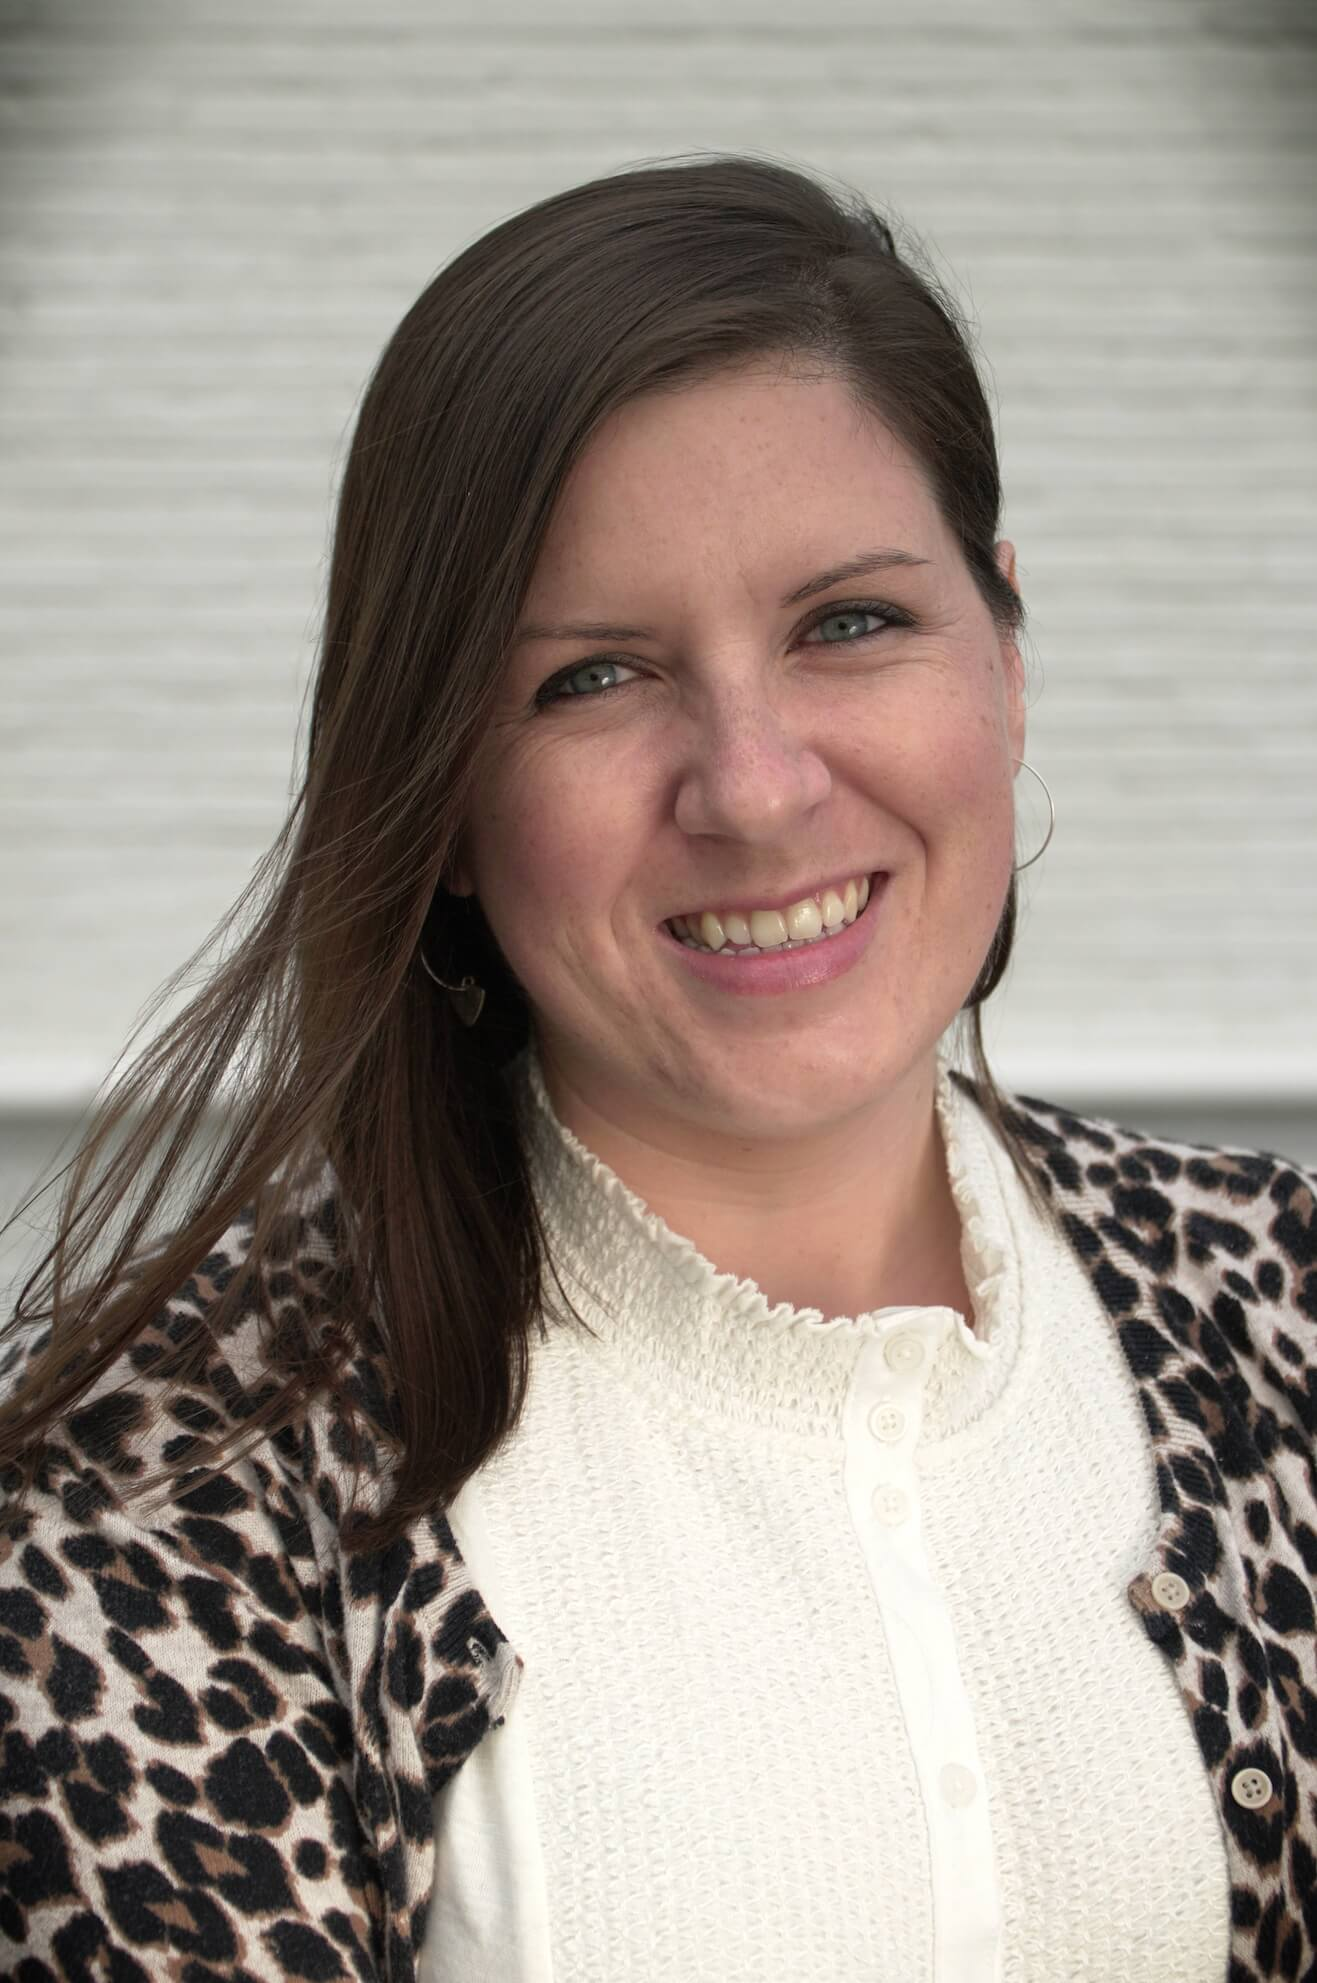 Susan Stutzman Child Therapist and Play Therapist